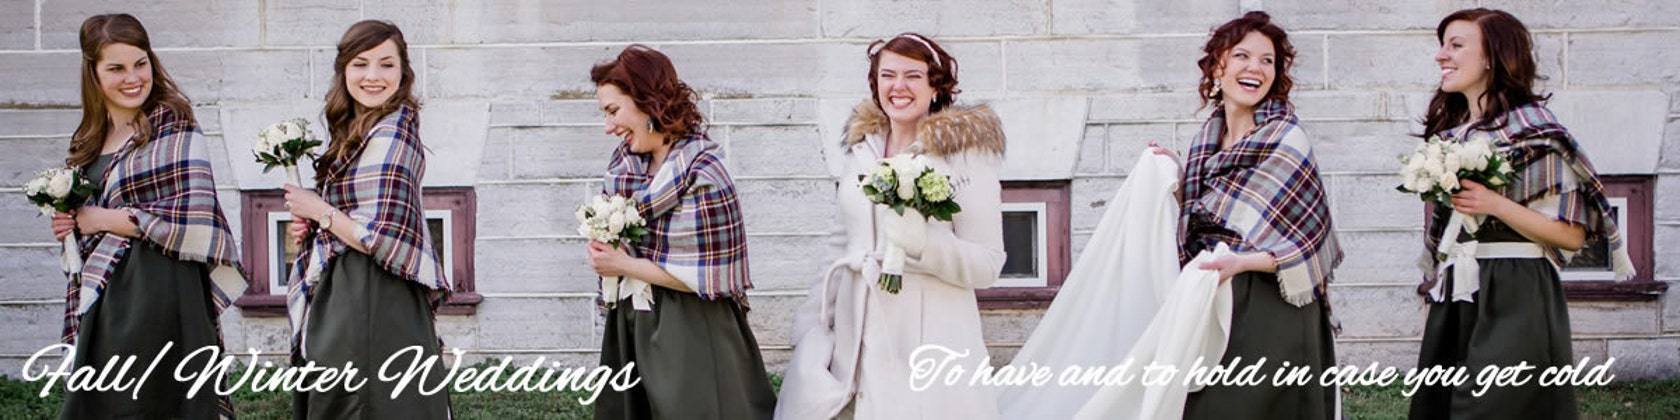 68bdd6422e2 Blanket tartan plaid scarves and wedding blanket by WhereToGet